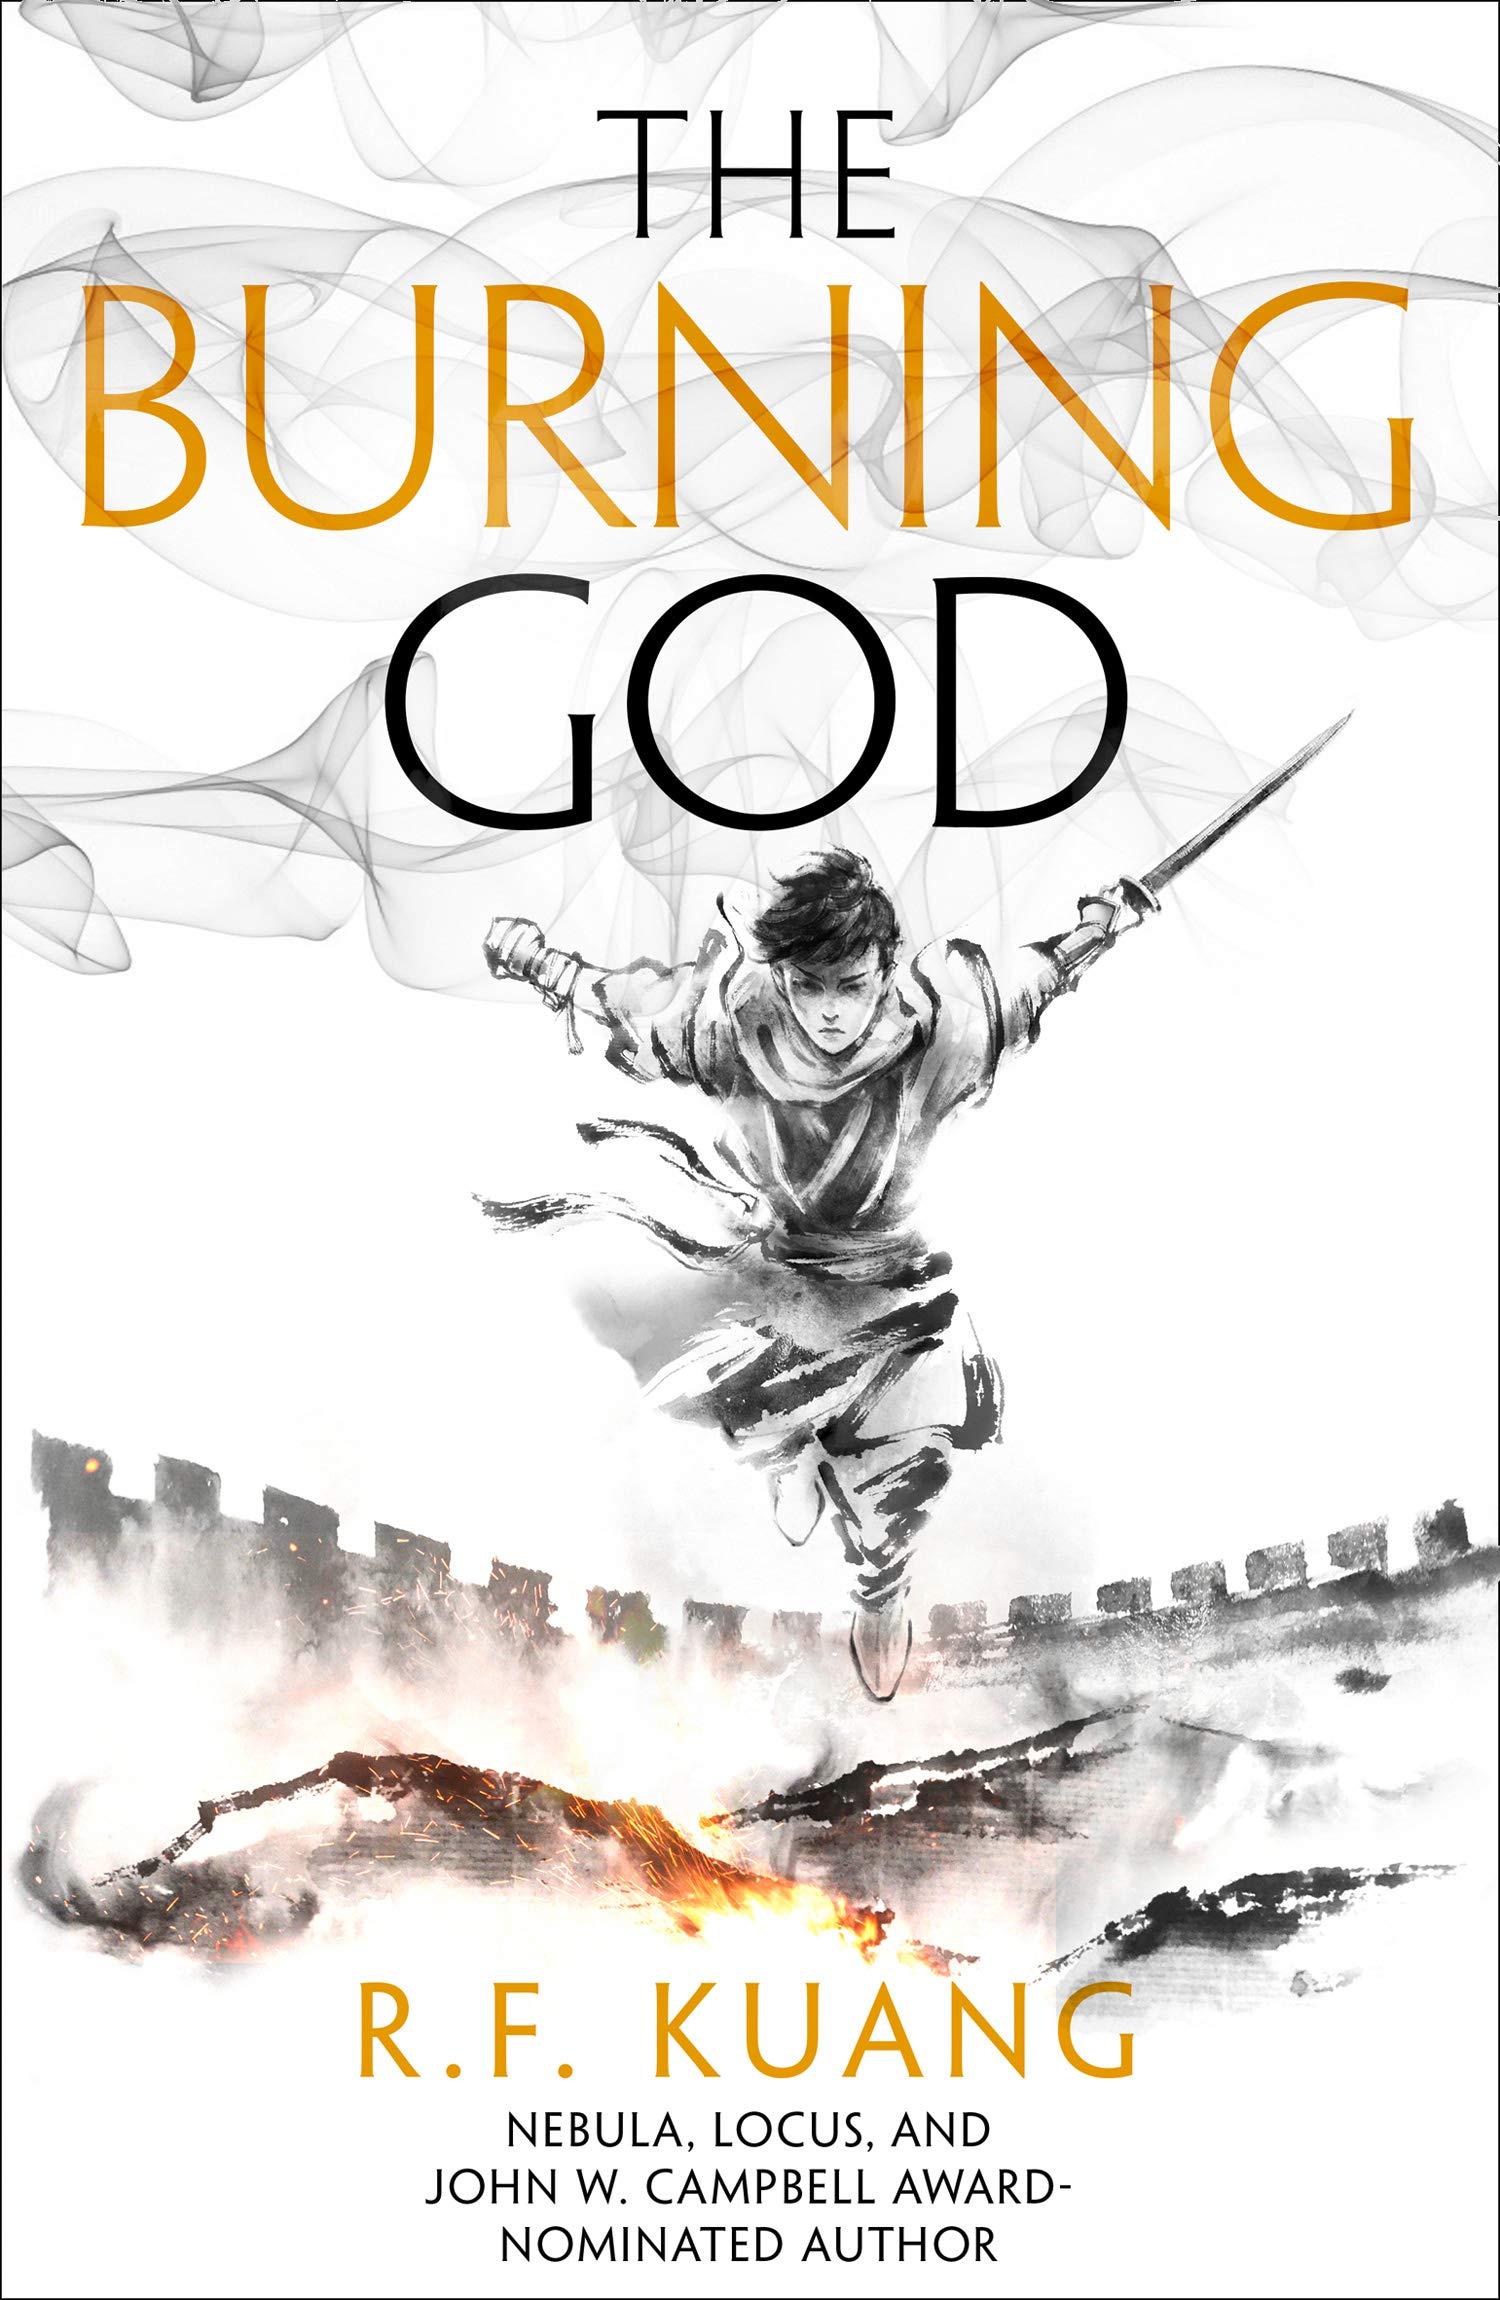 The Burning God (The Poppy War, Book 3): Amazon.co.uk: Kuang, R.F. ...